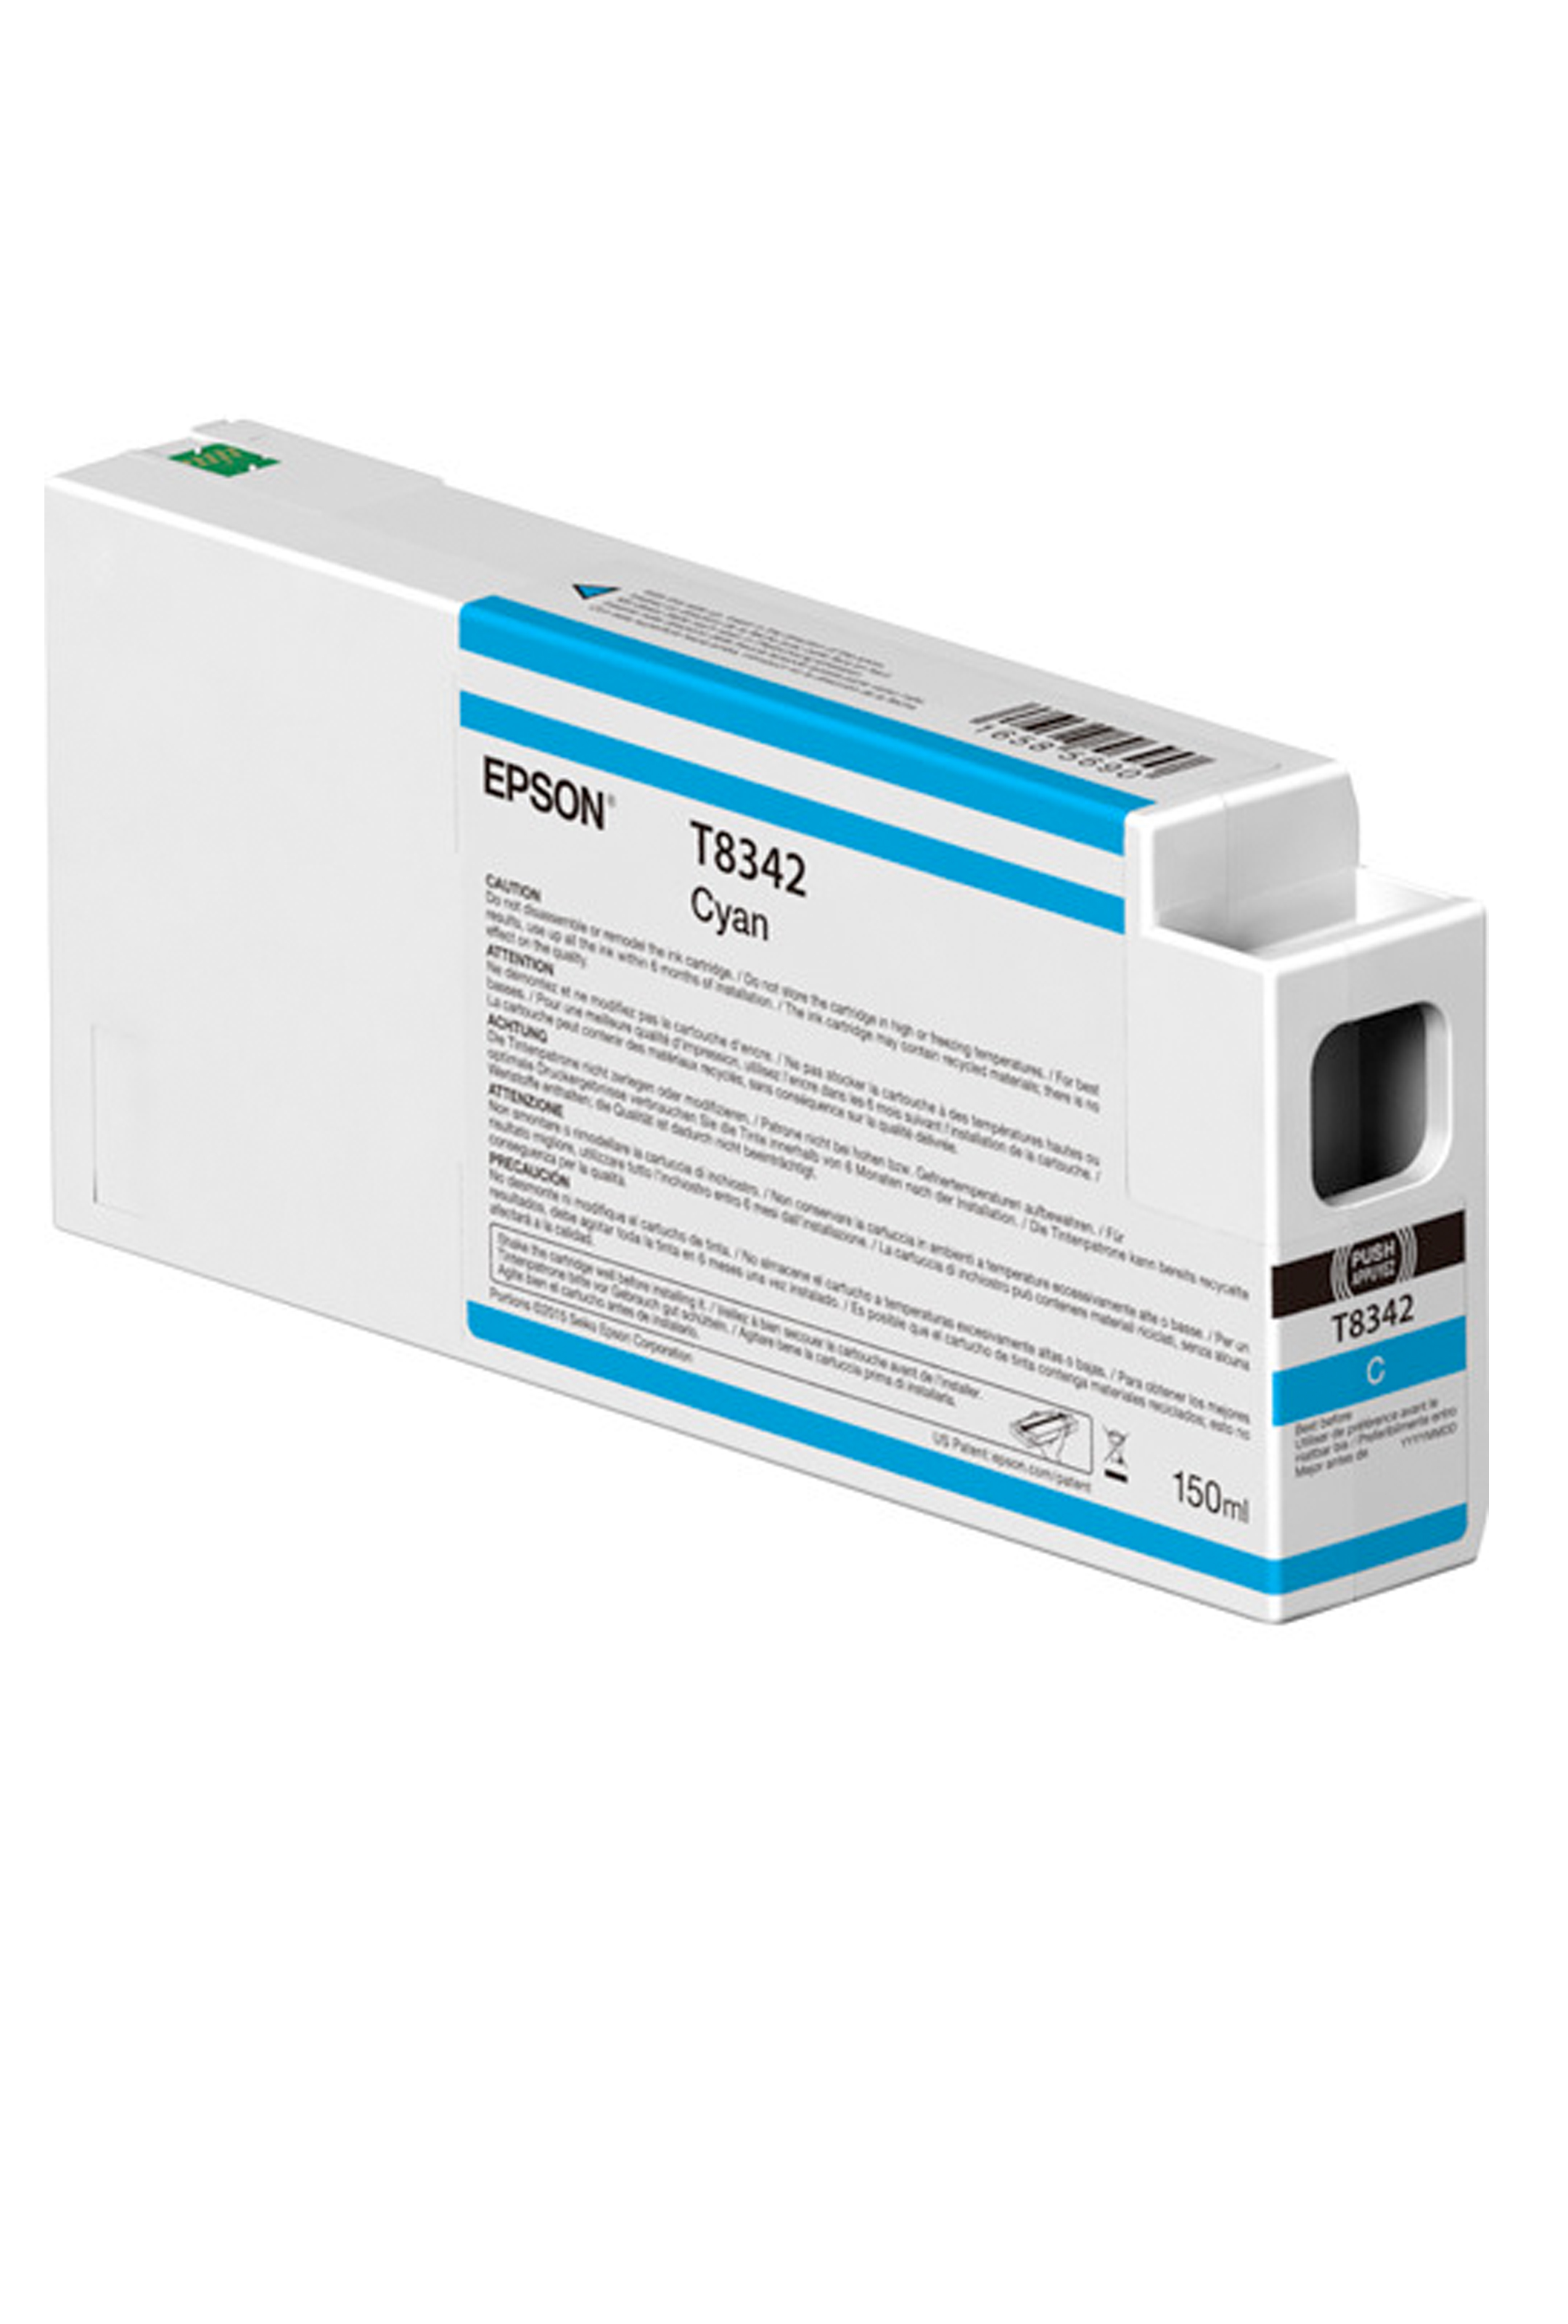 Epson EPSON SD CYAN INK (150 ML) (T834200)